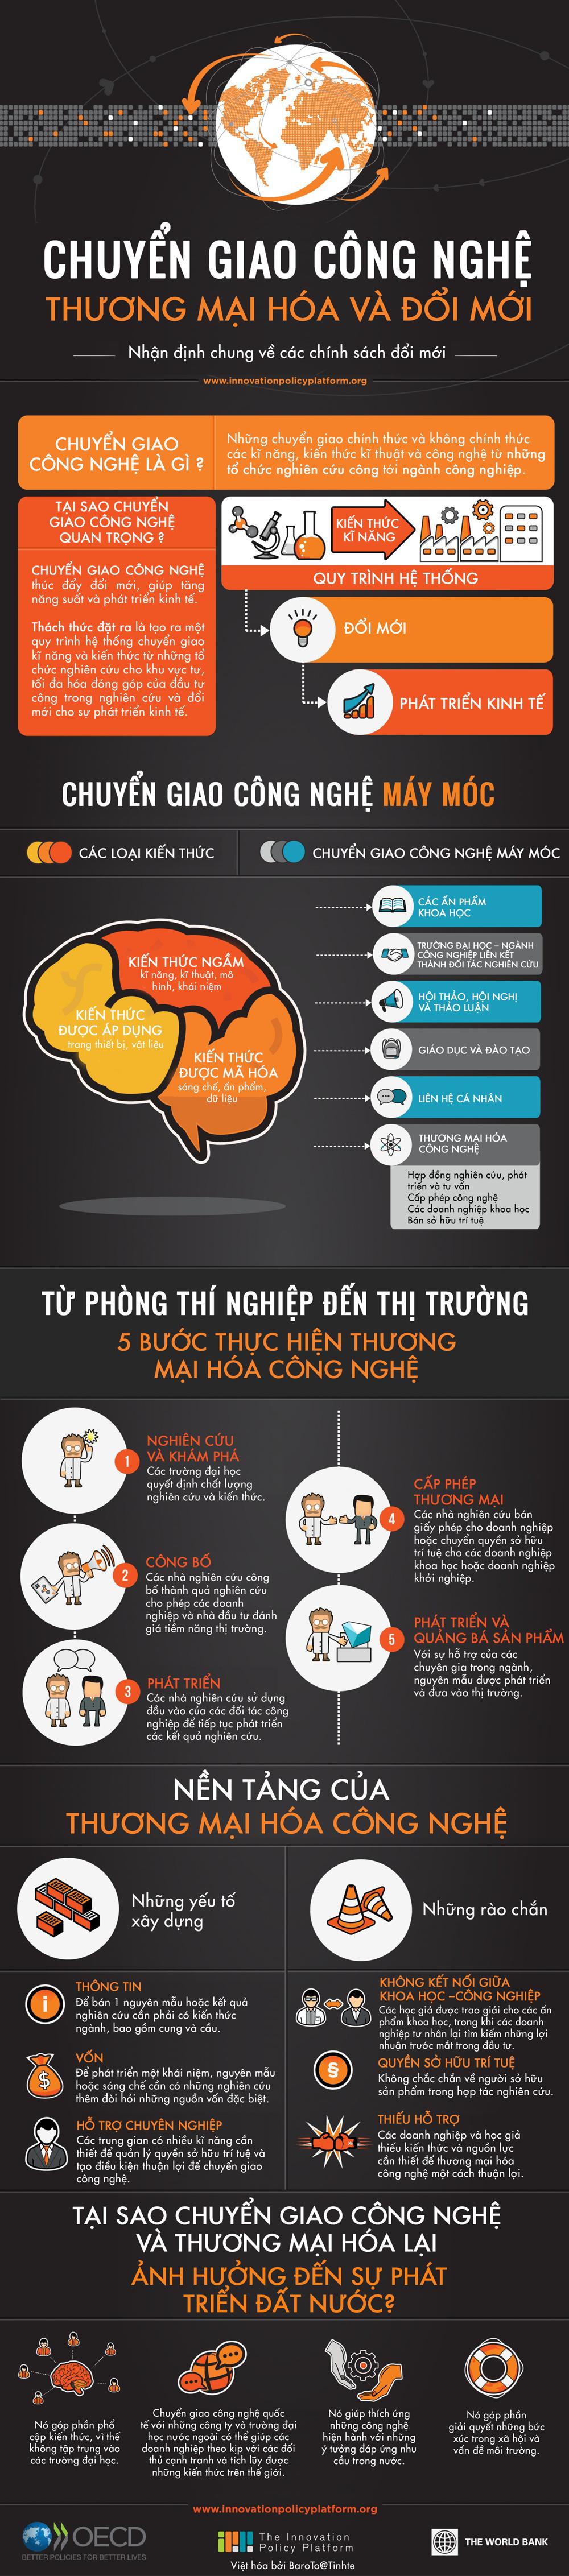 Infographic - Chuyển Giao Công Nghệ